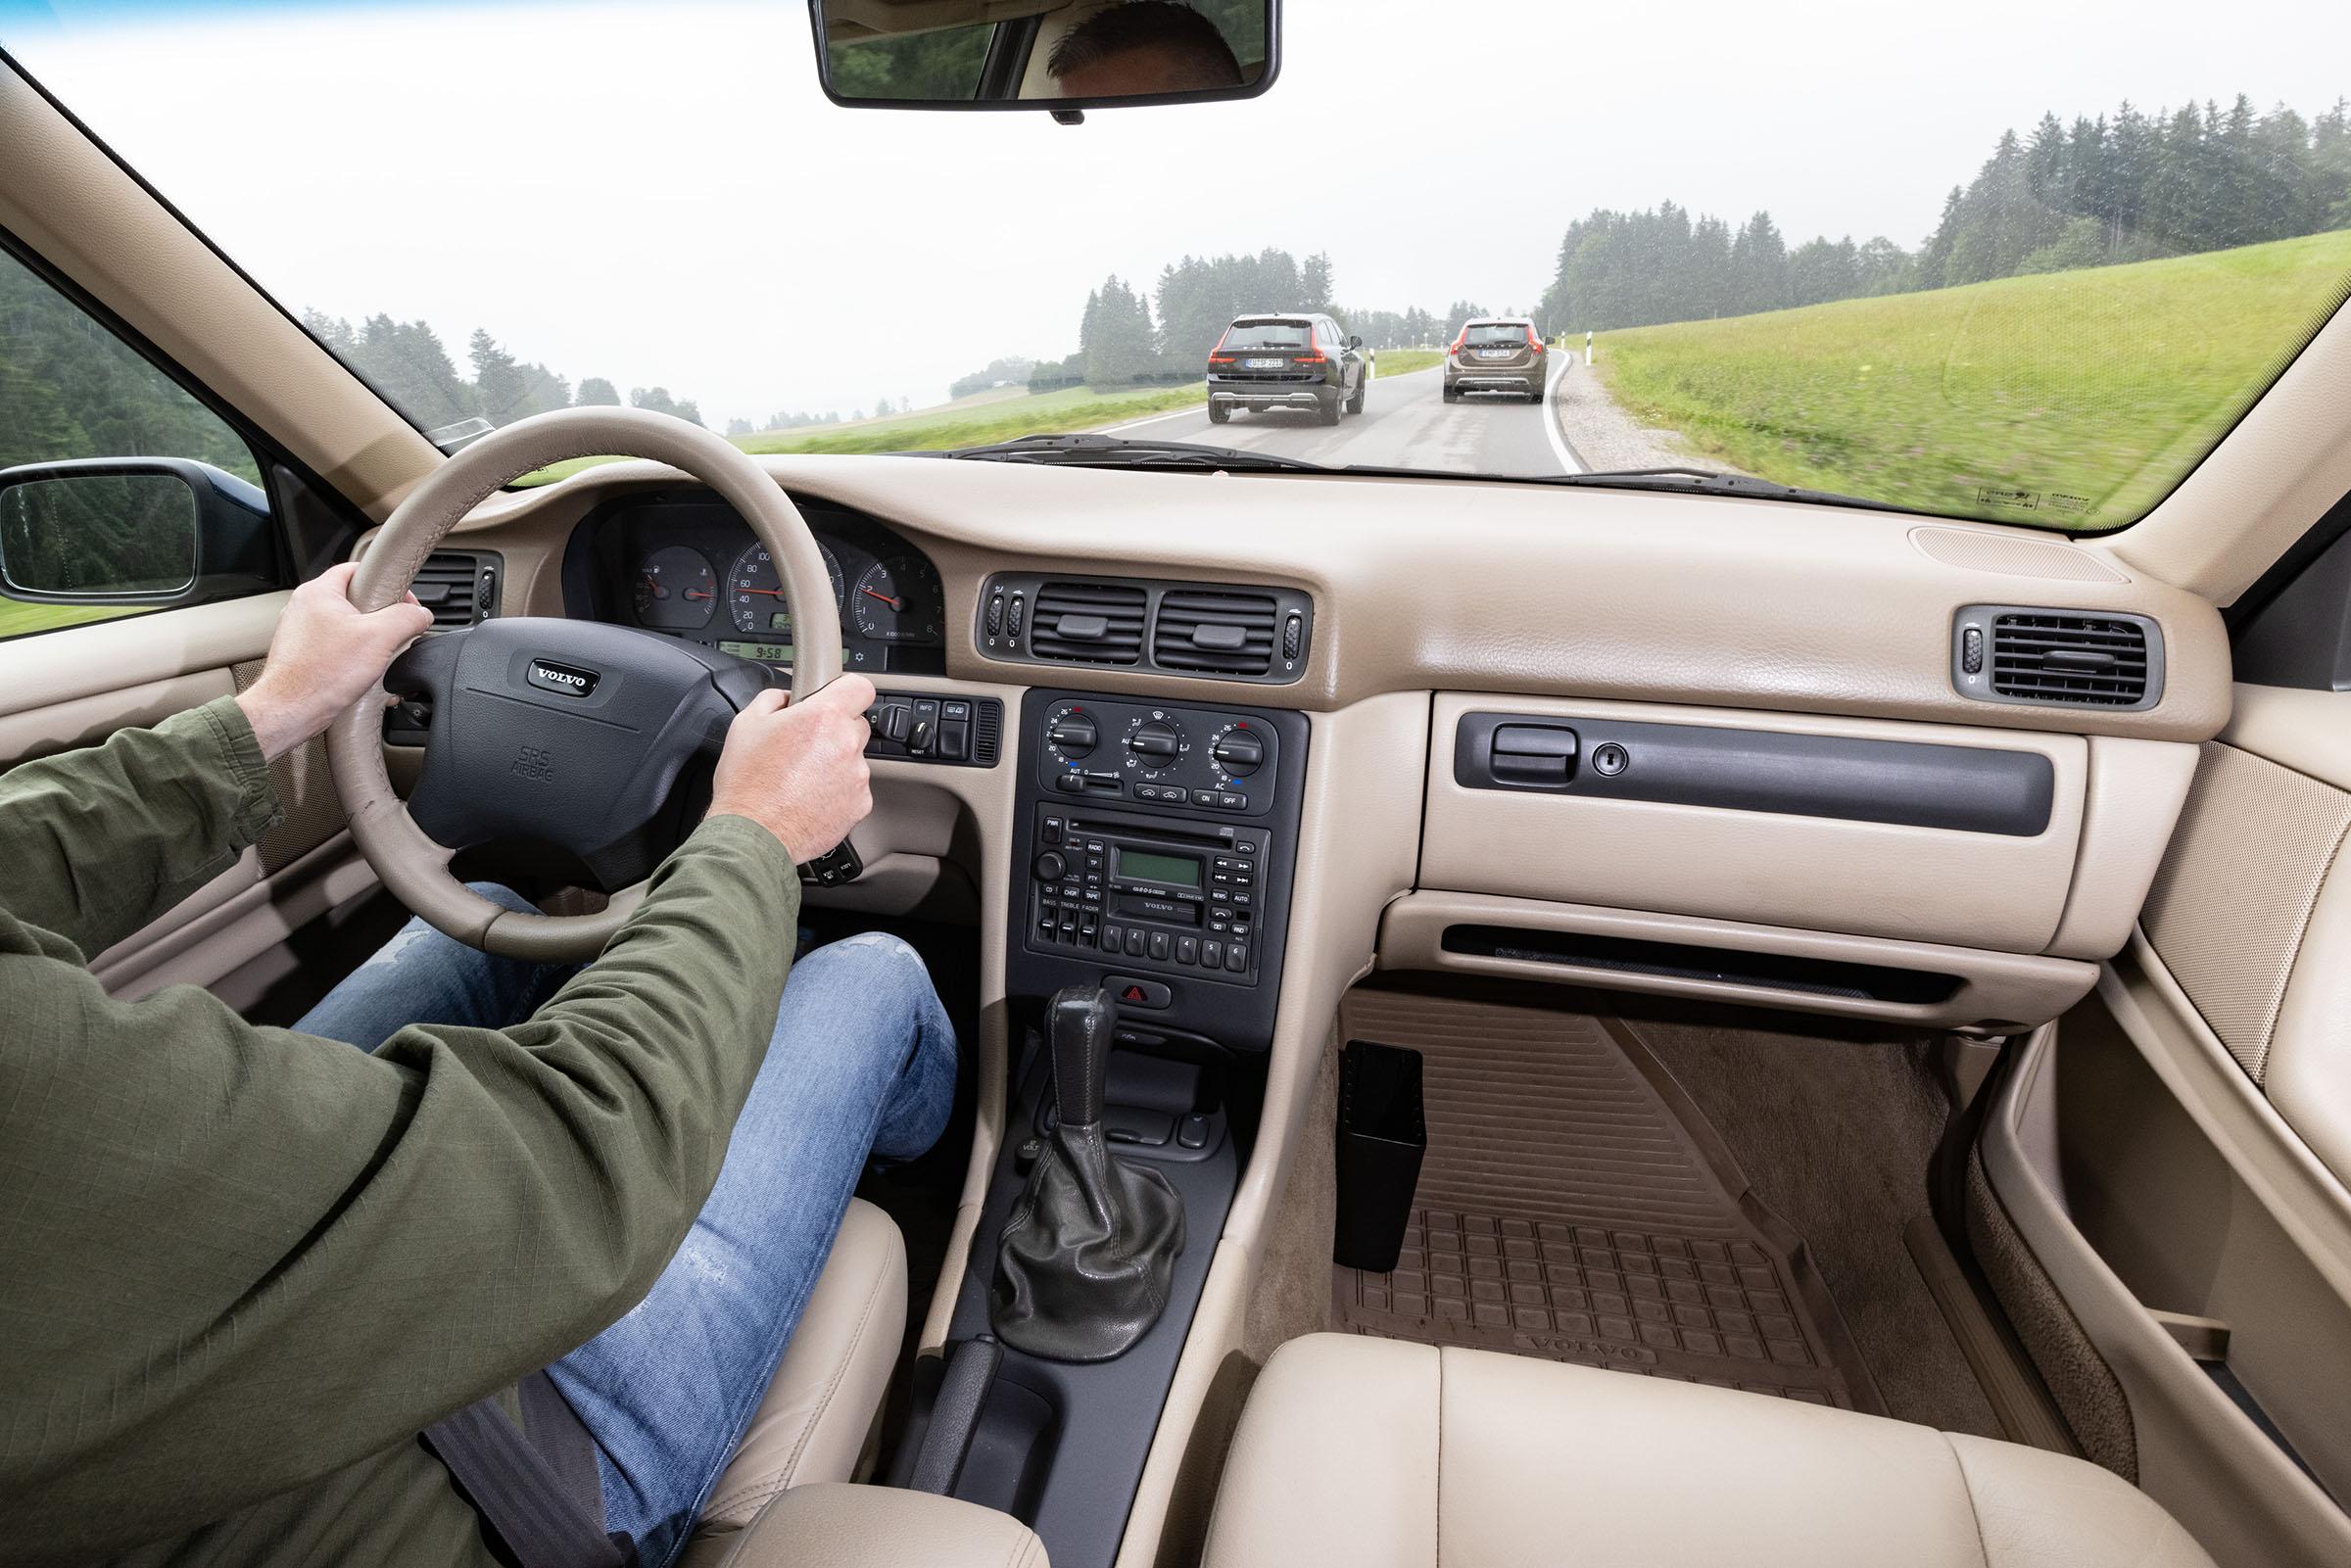 Volvo Cross Country V70XC interior